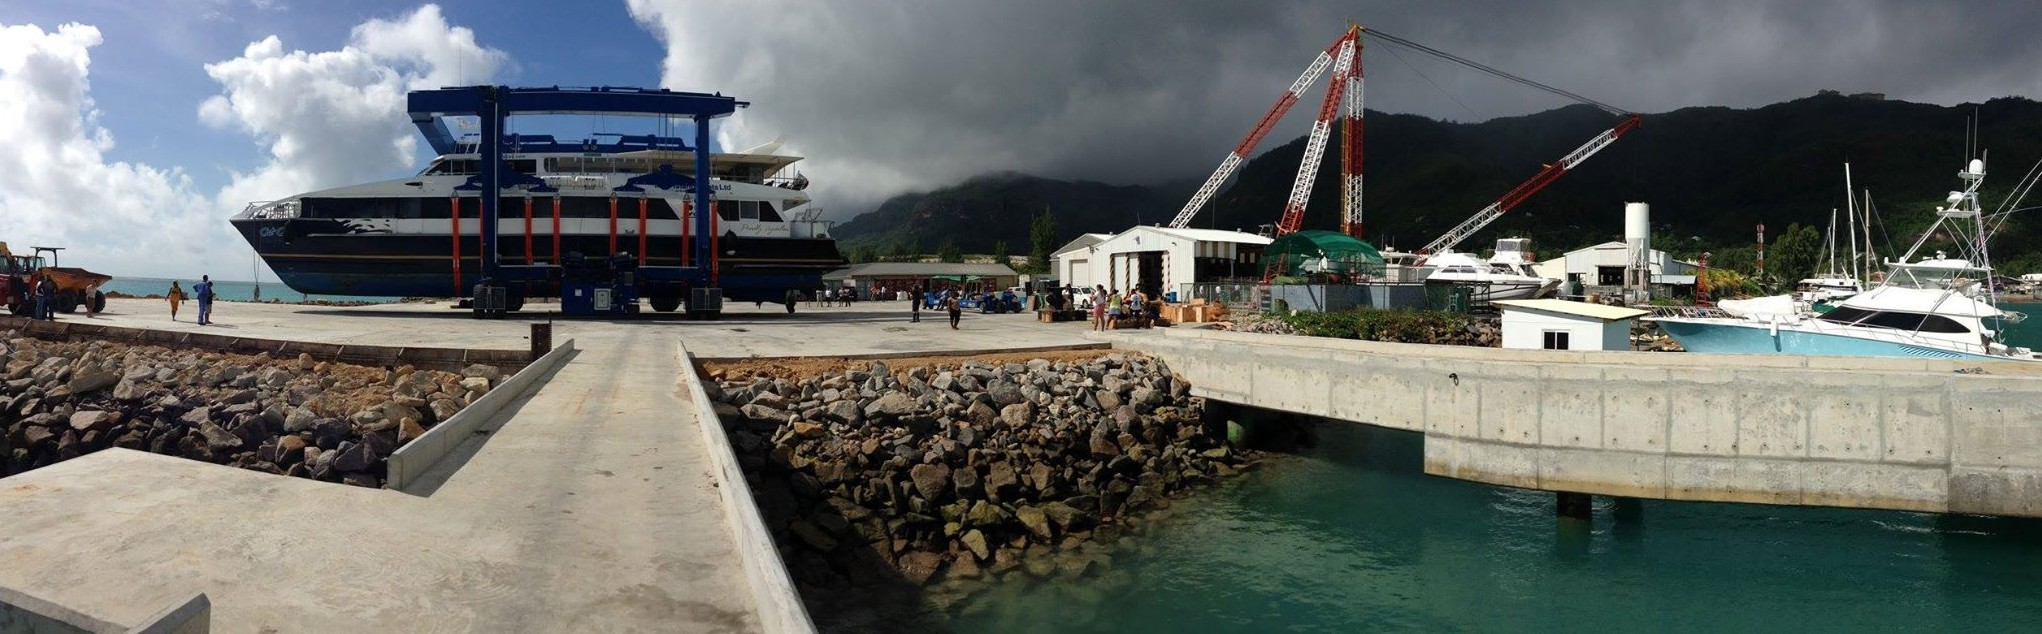 marine-travel-lift-in-seychelles